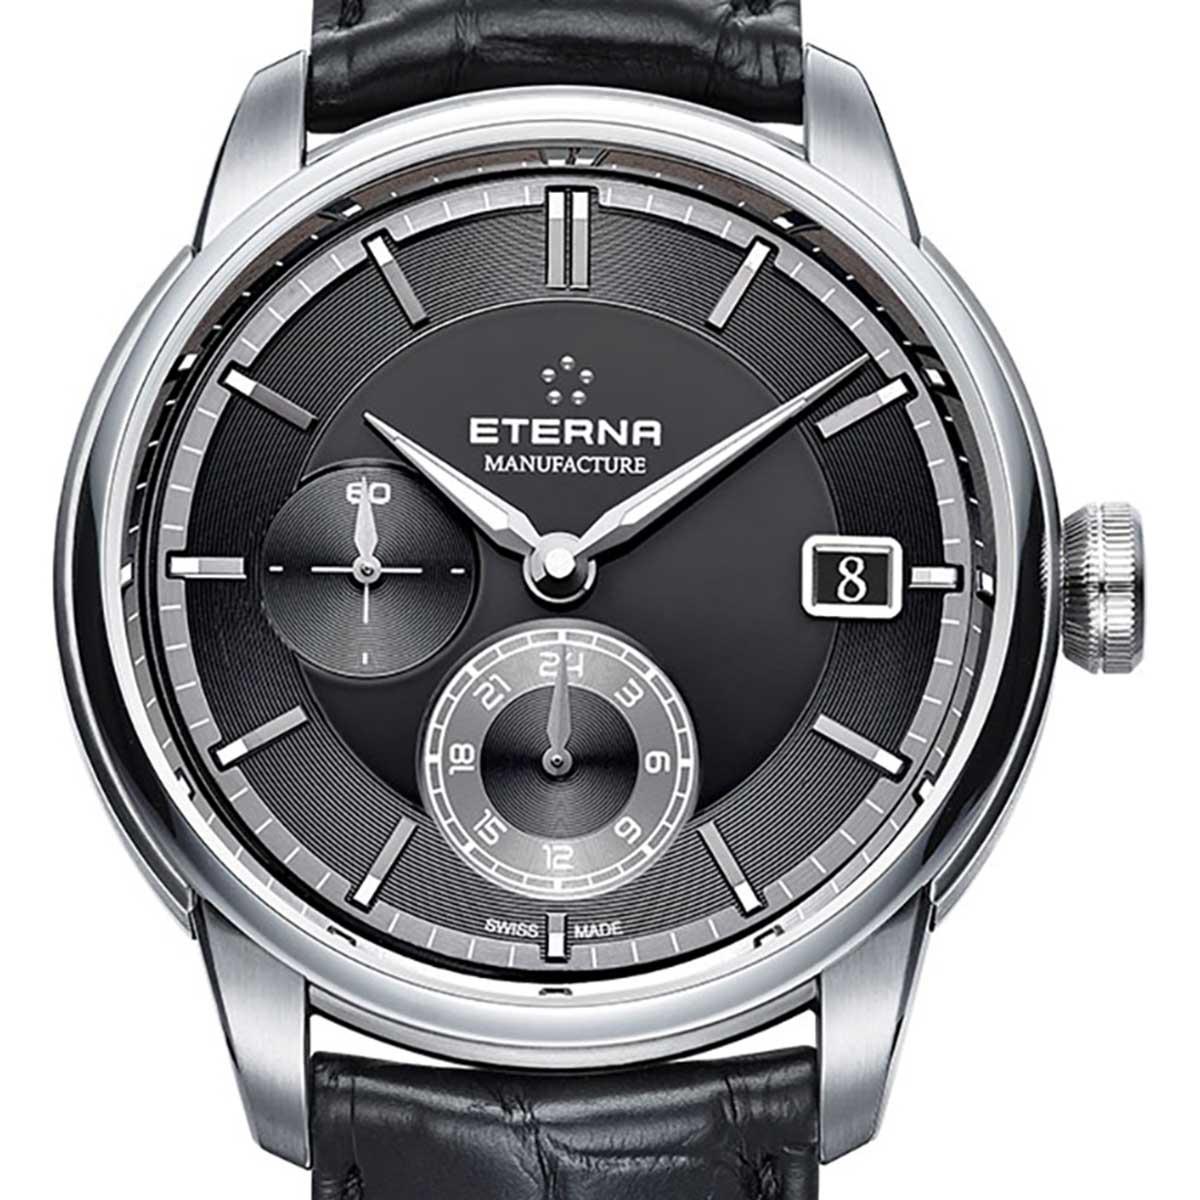 Eterna エテルナ 自動巻き(手巻き機能あり) 腕時計 [7661-41-46-1324] 並行輸入品 カレンダー GMT(ワールドタイム)